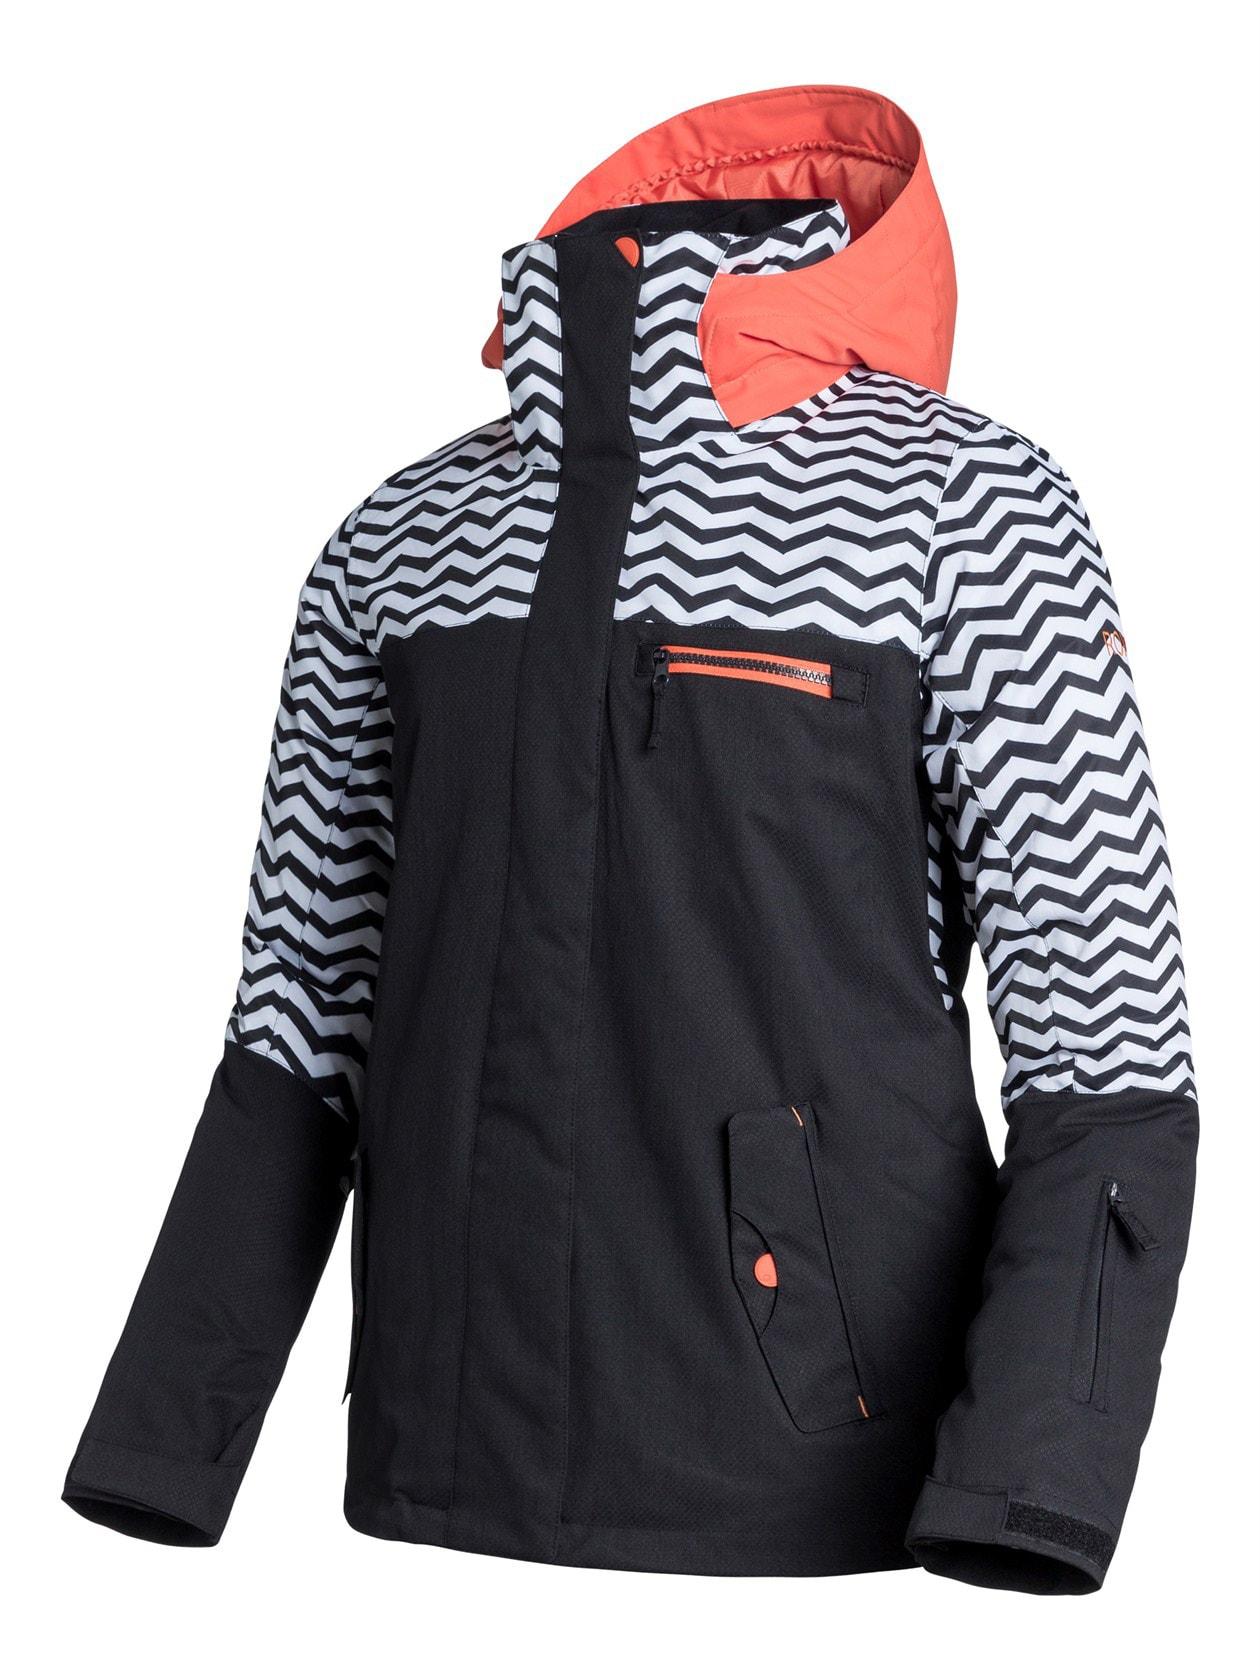 Roxy Jetty Block Snowboard Jacket - thumbnail 2